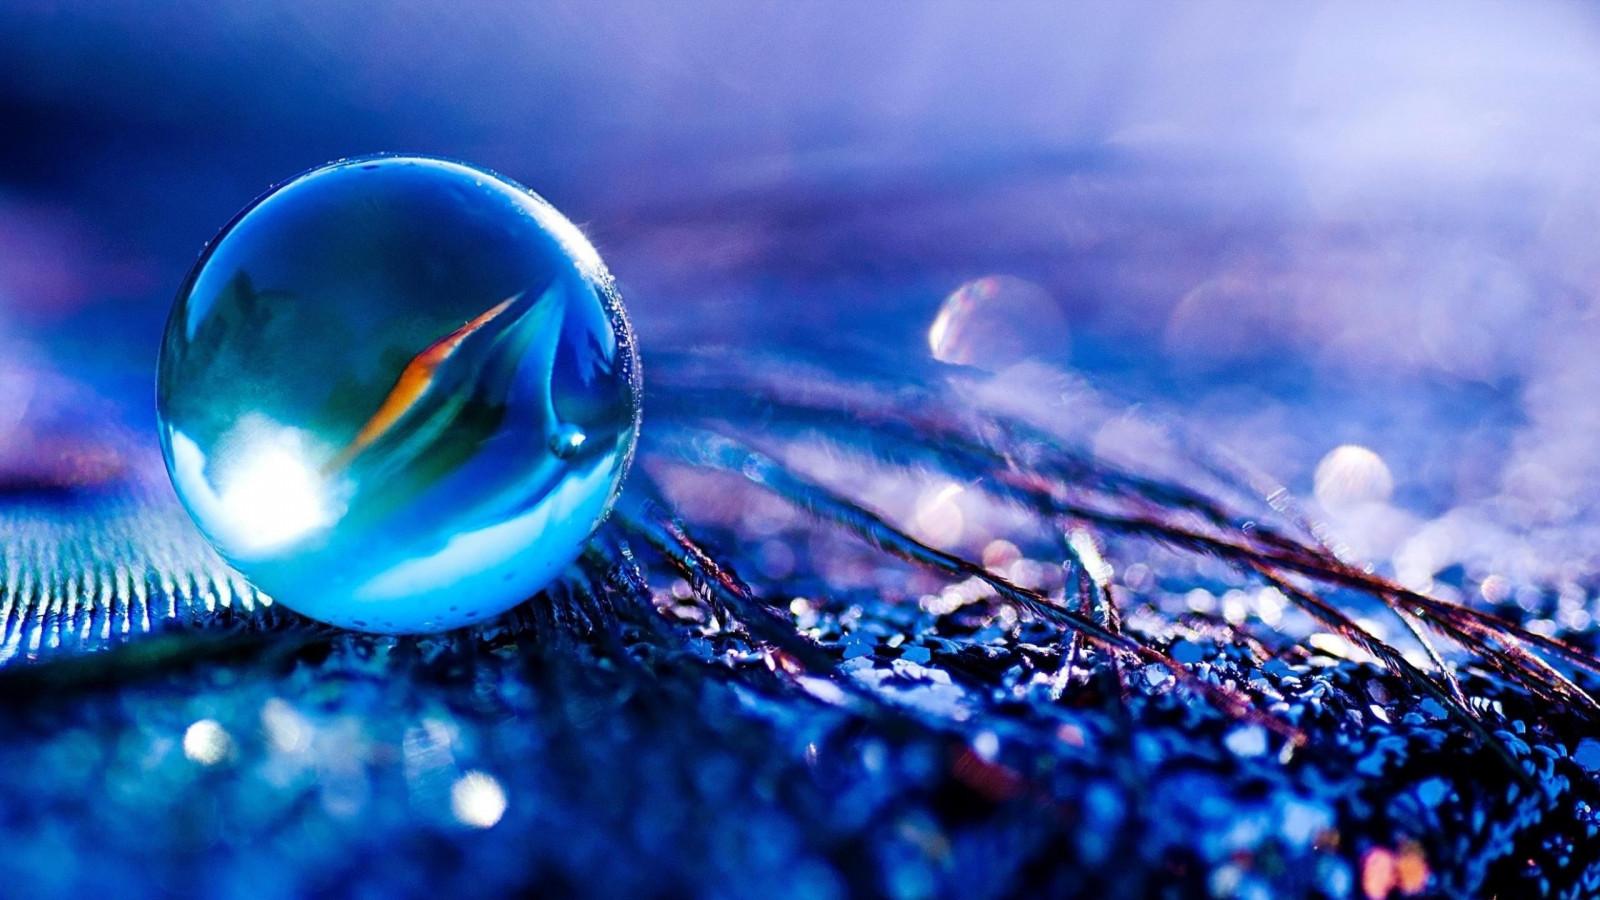 Wallpaper Sunlight Water Reflection Sphere Blue Glass